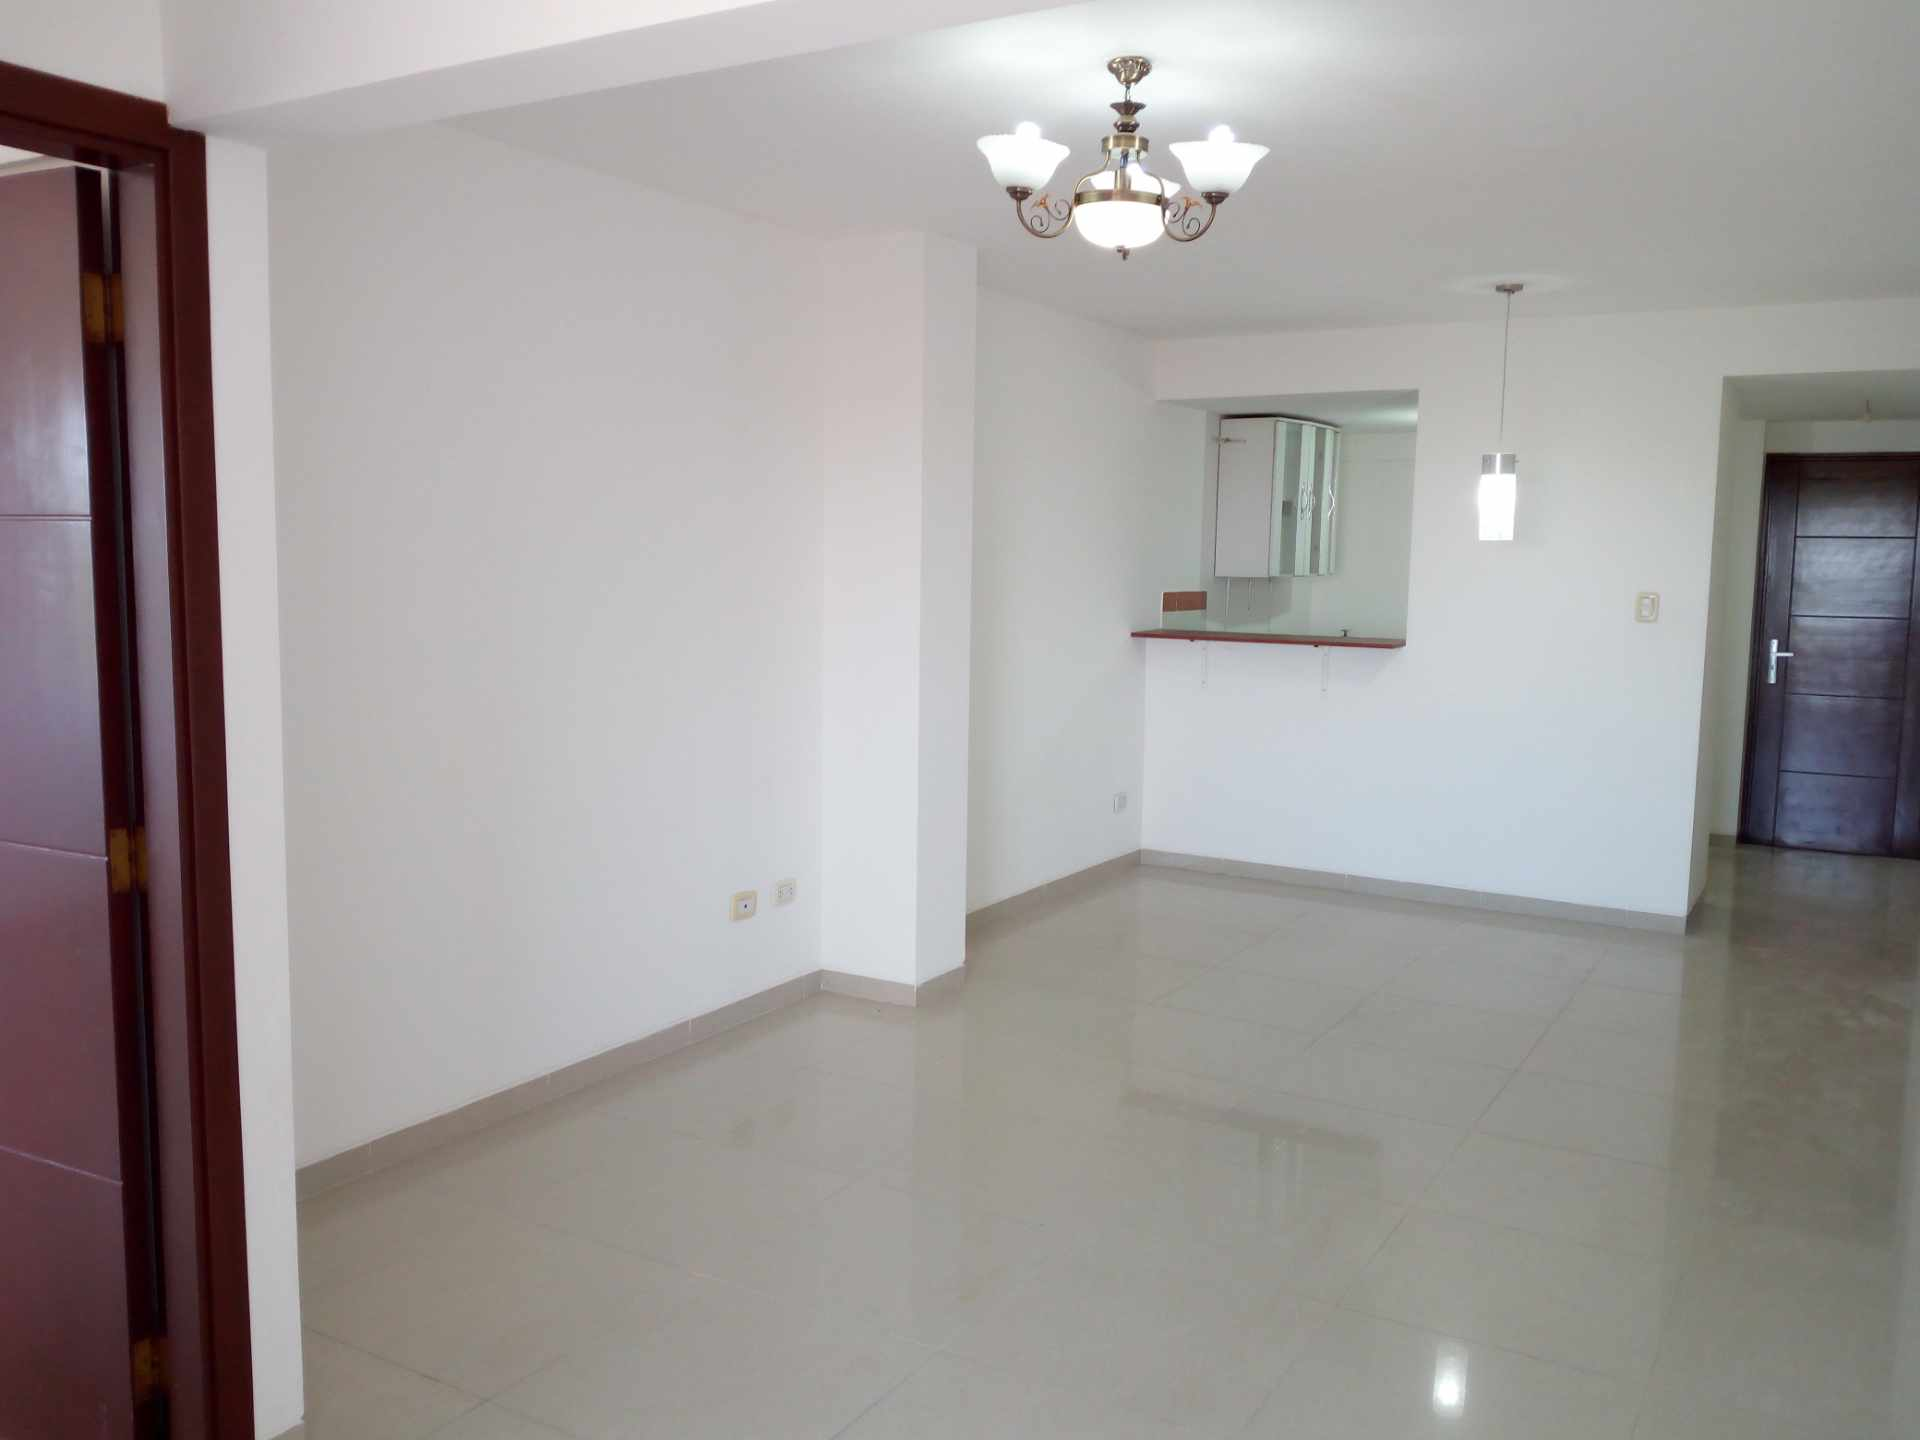 Departamento en Venta Entre 3er y 2do Anillo, Av. Guapay (Canal Cotoca) Foto 3